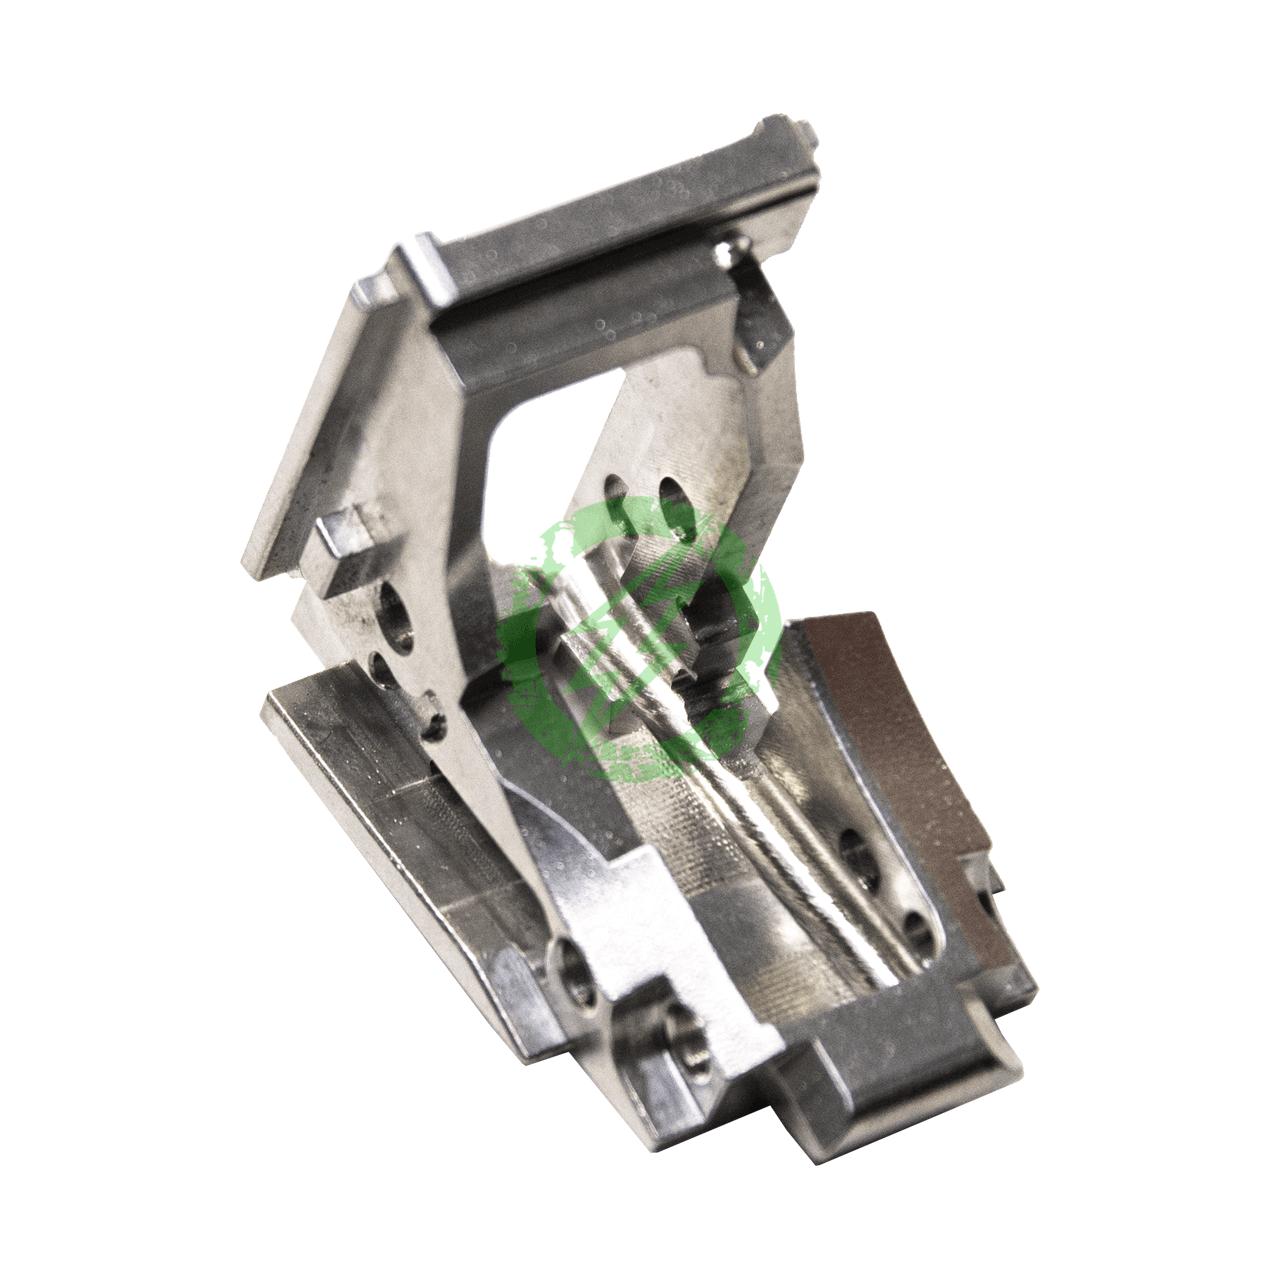 COWCOW Technology Umarex Glock Series Stainless Steel Hammer Housing